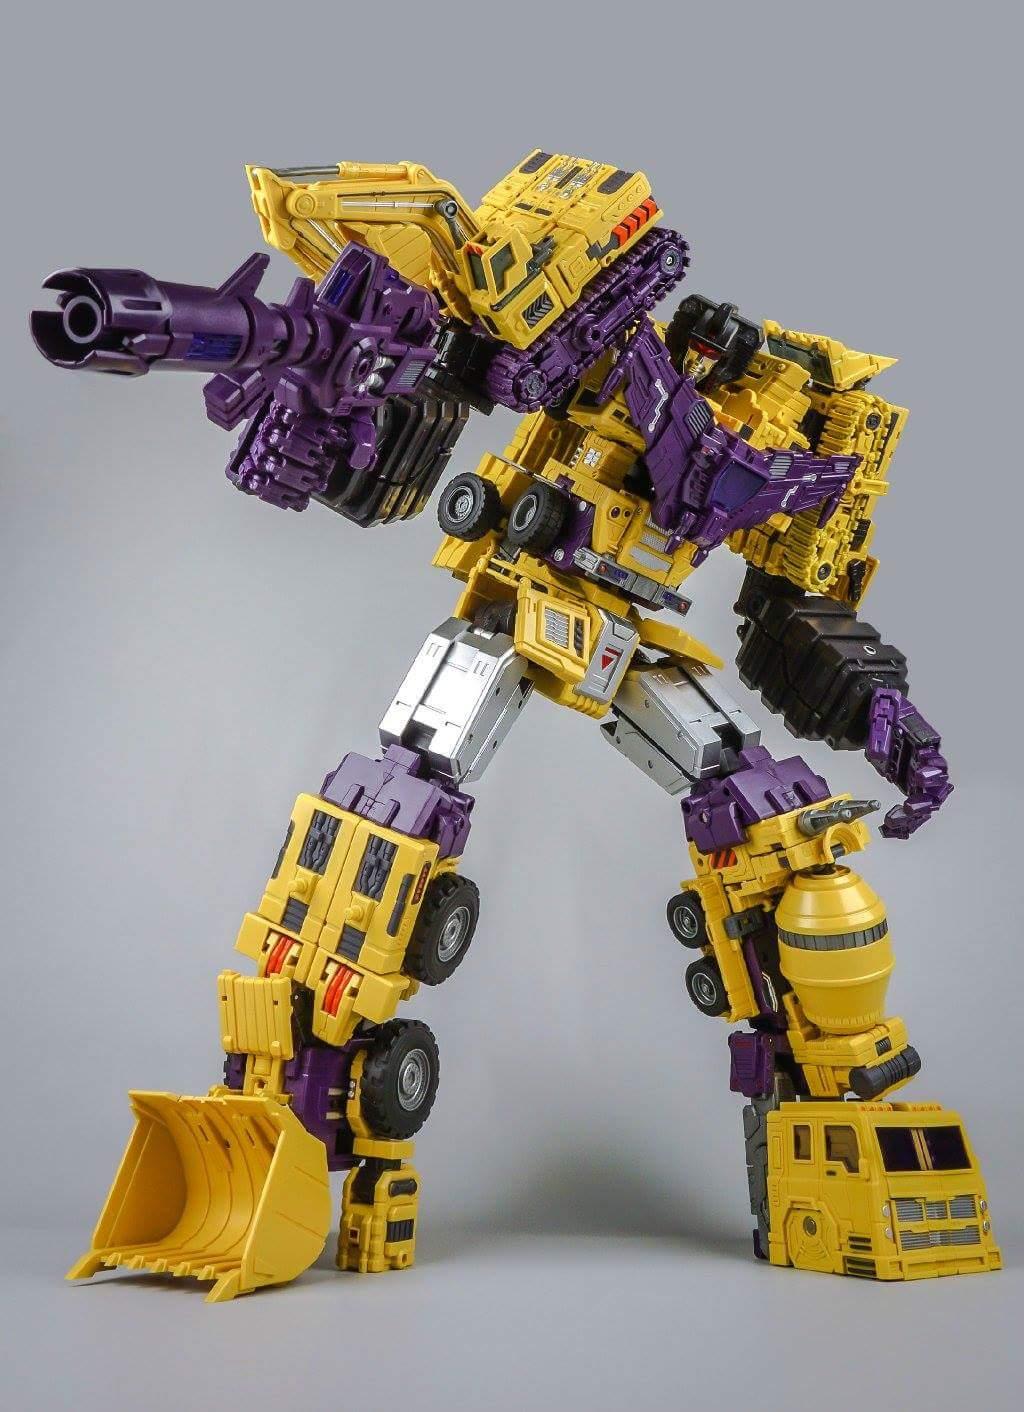 [Toyworld] Produit Tiers - Jouet TW-C Constructor aka Devastator/Dévastateur (Version vert G1 et jaune G2) - Page 8 KjLaWMV5